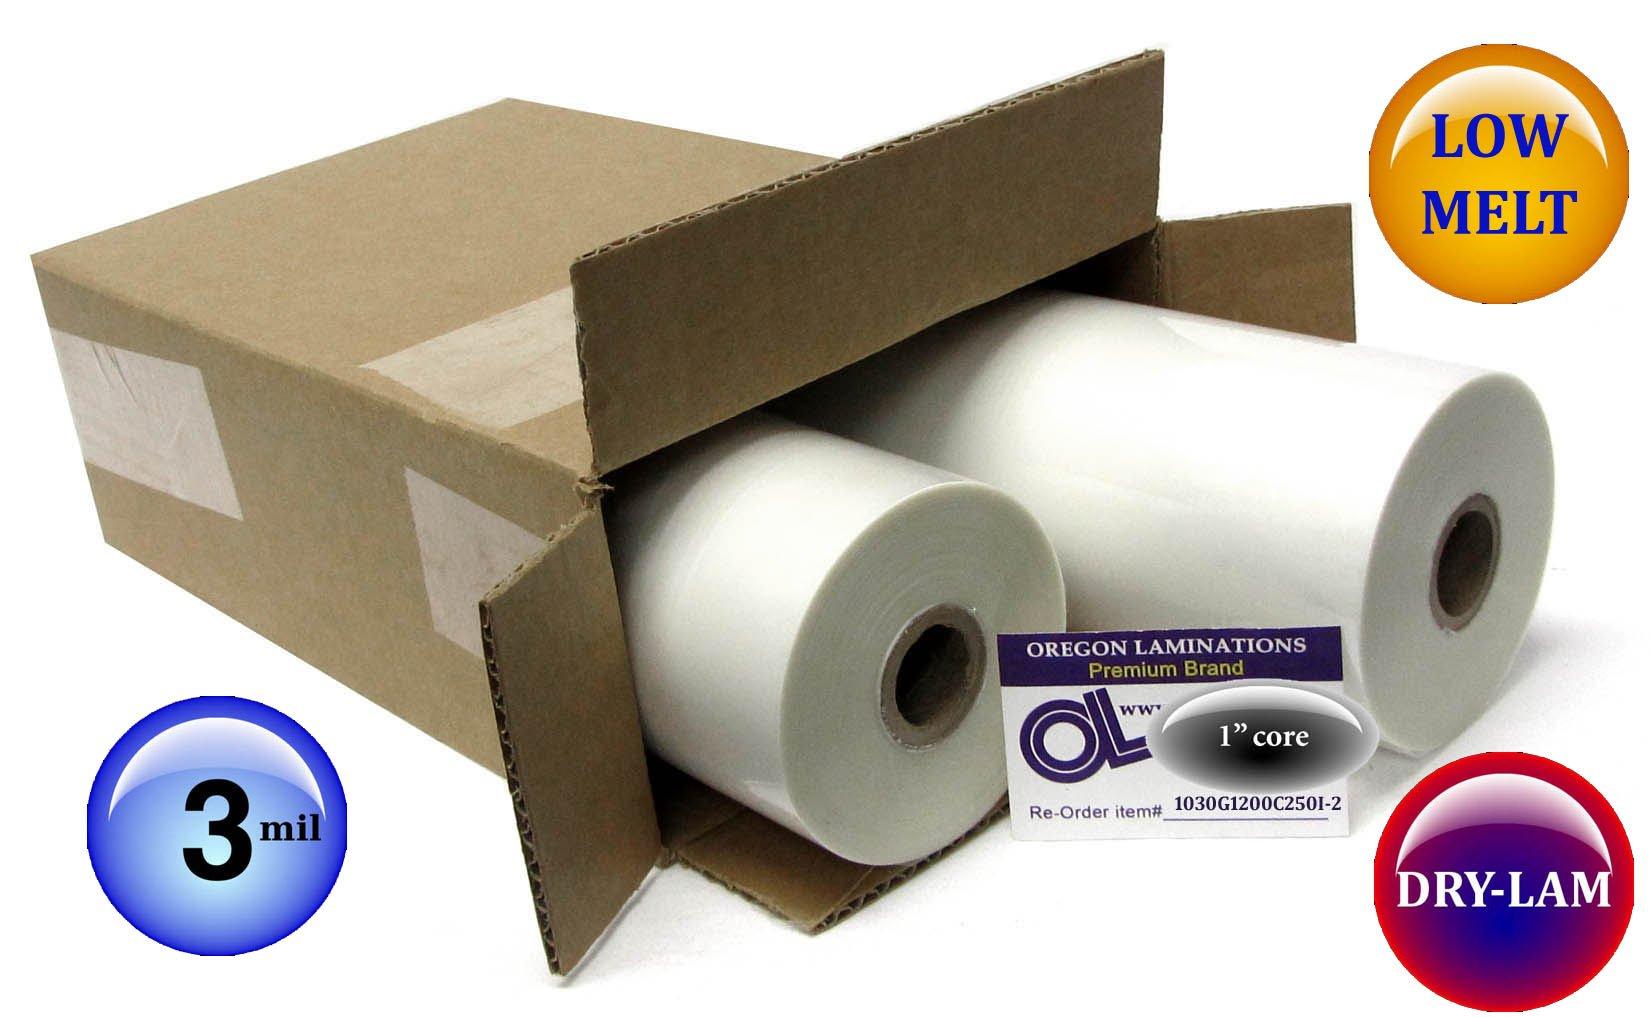 Dry-Lam Trade-Lam Low Melt Laminating Film 12-inch x 250-feet x 1-inch core (4 Rolls) 3.0 Mil Gloss